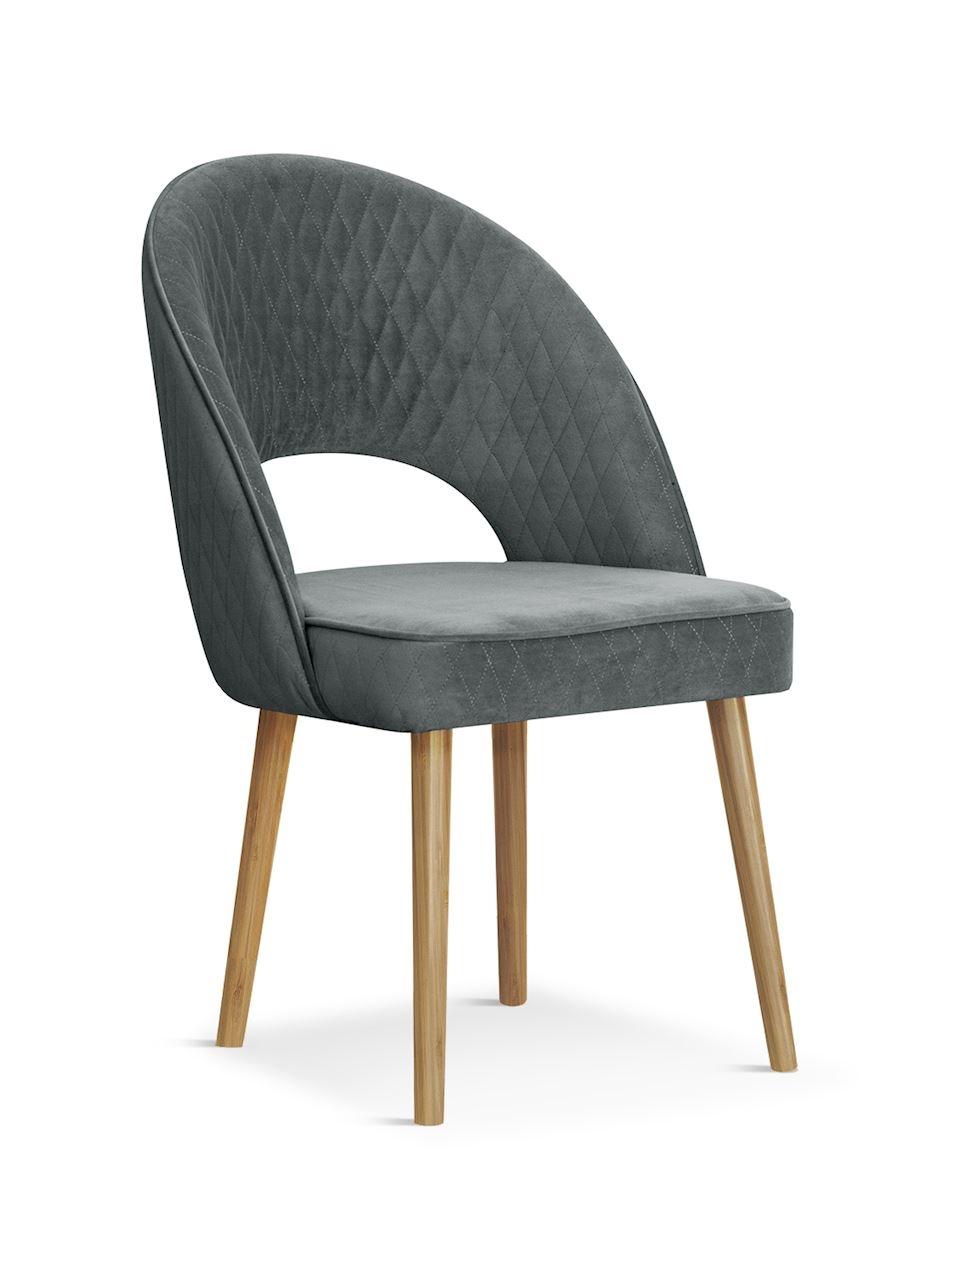 Scaun tapitat cu stofa si picioare din lemn Ponte Velvet Gri / Stejar, l56xA63xH89 cm